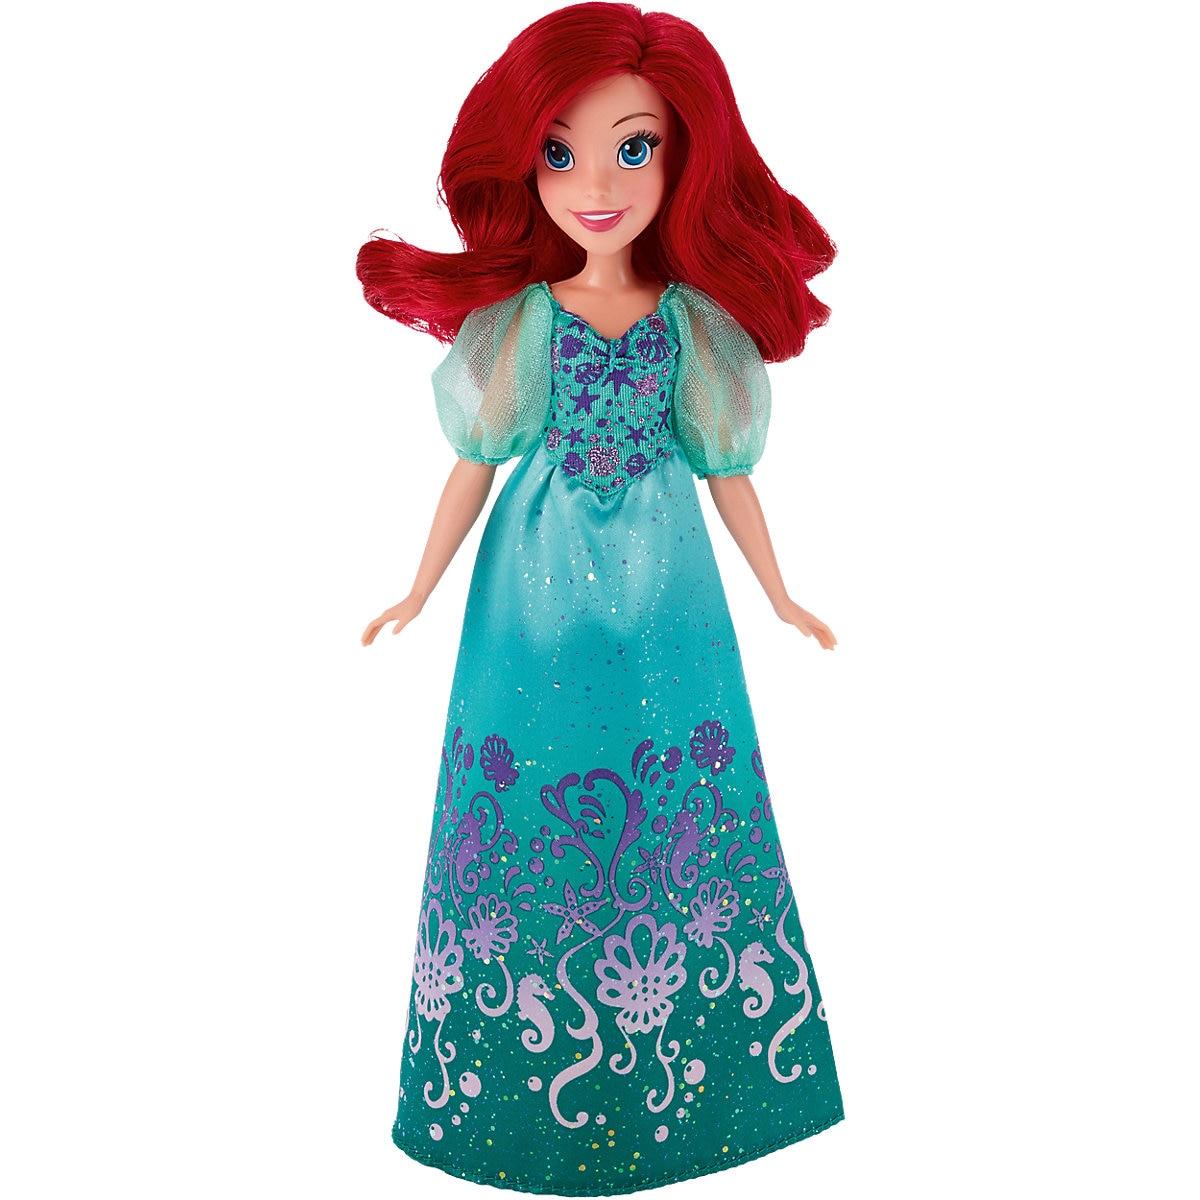 HASBRO muñecas 4443703 niñas juguetes para niños niñas juguete moda muñeca juego accesorios niños novia MTpromo